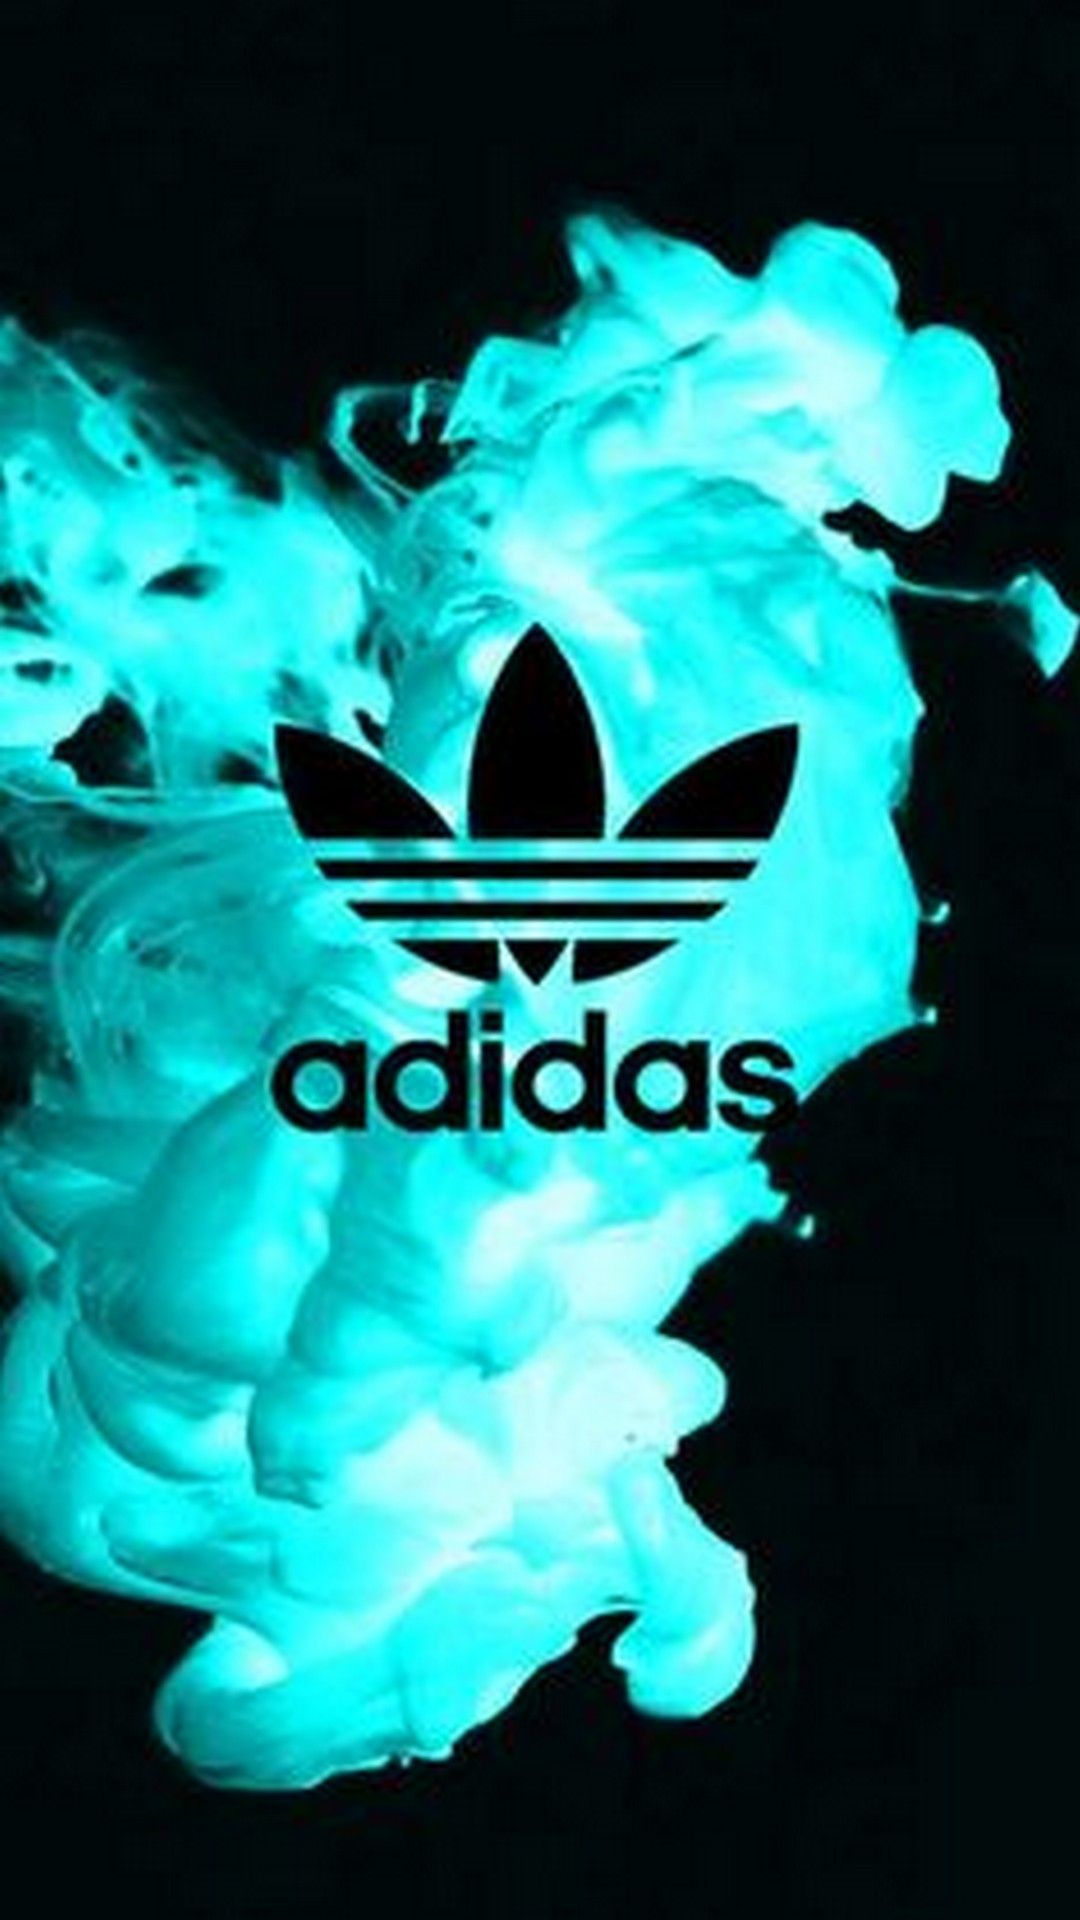 Adidas Wallpaper Adidas wallpaper iphone, Adidas iphone